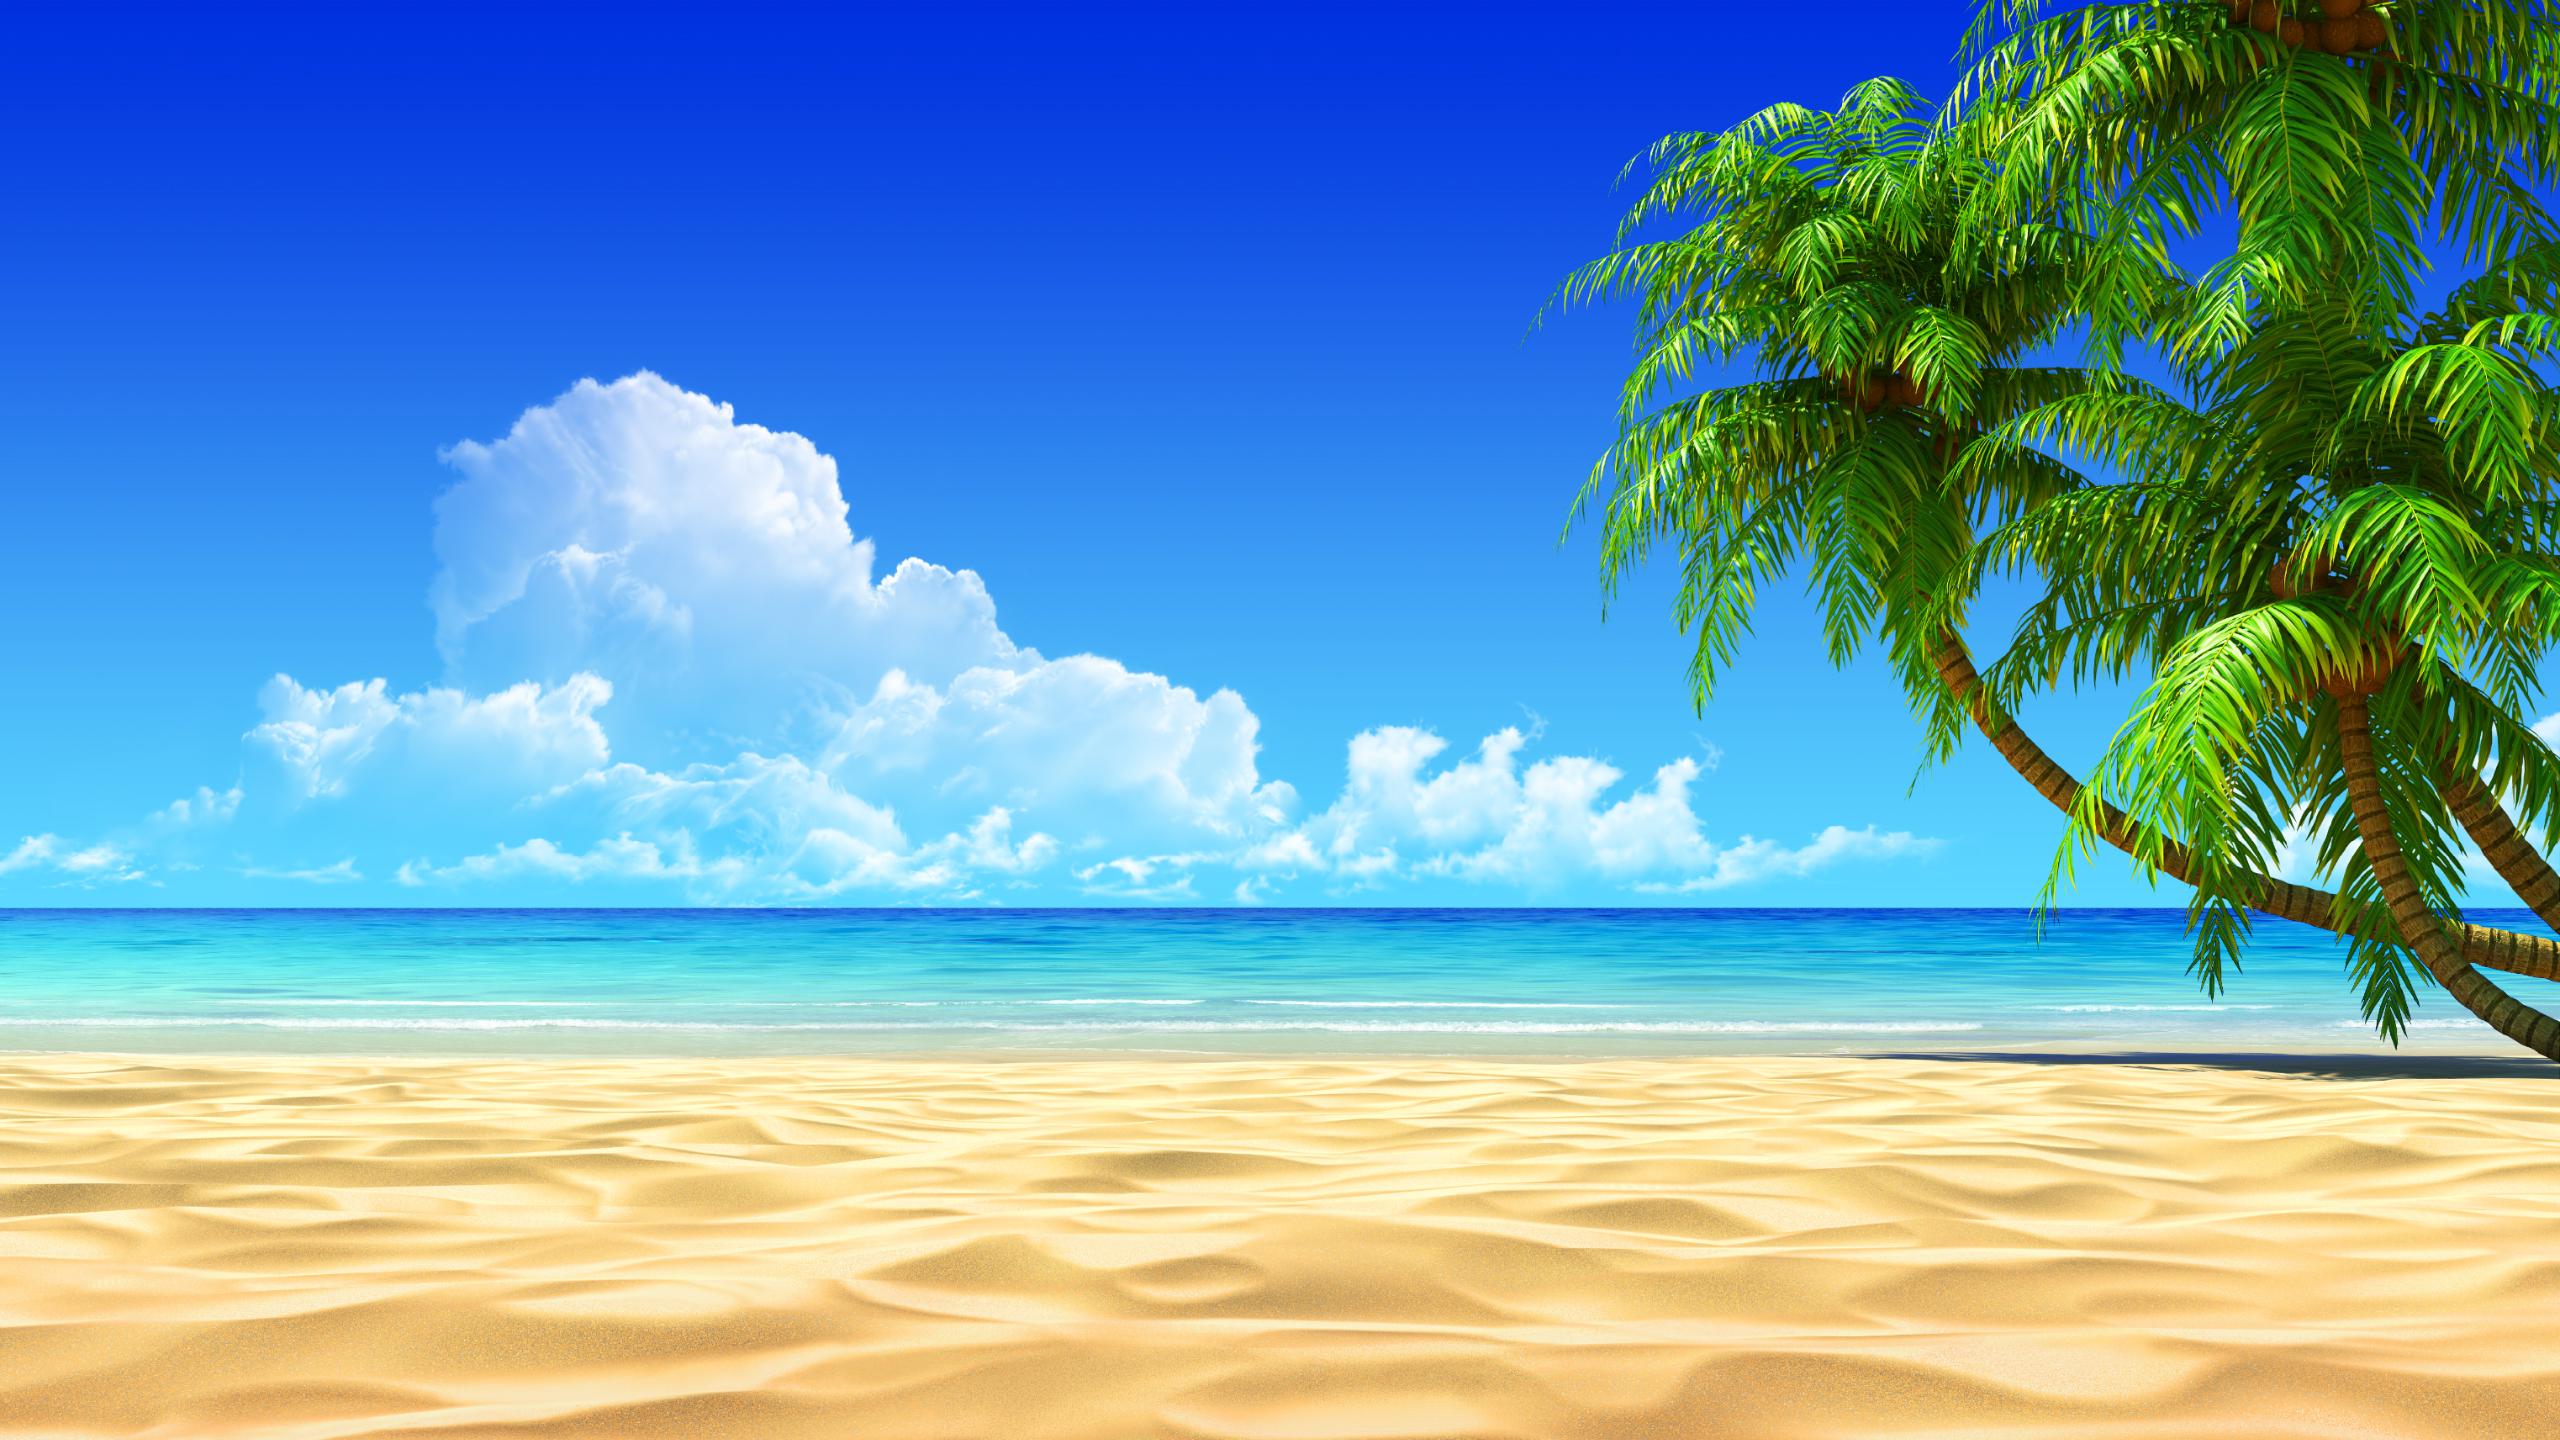 Sea clipart beach background #11